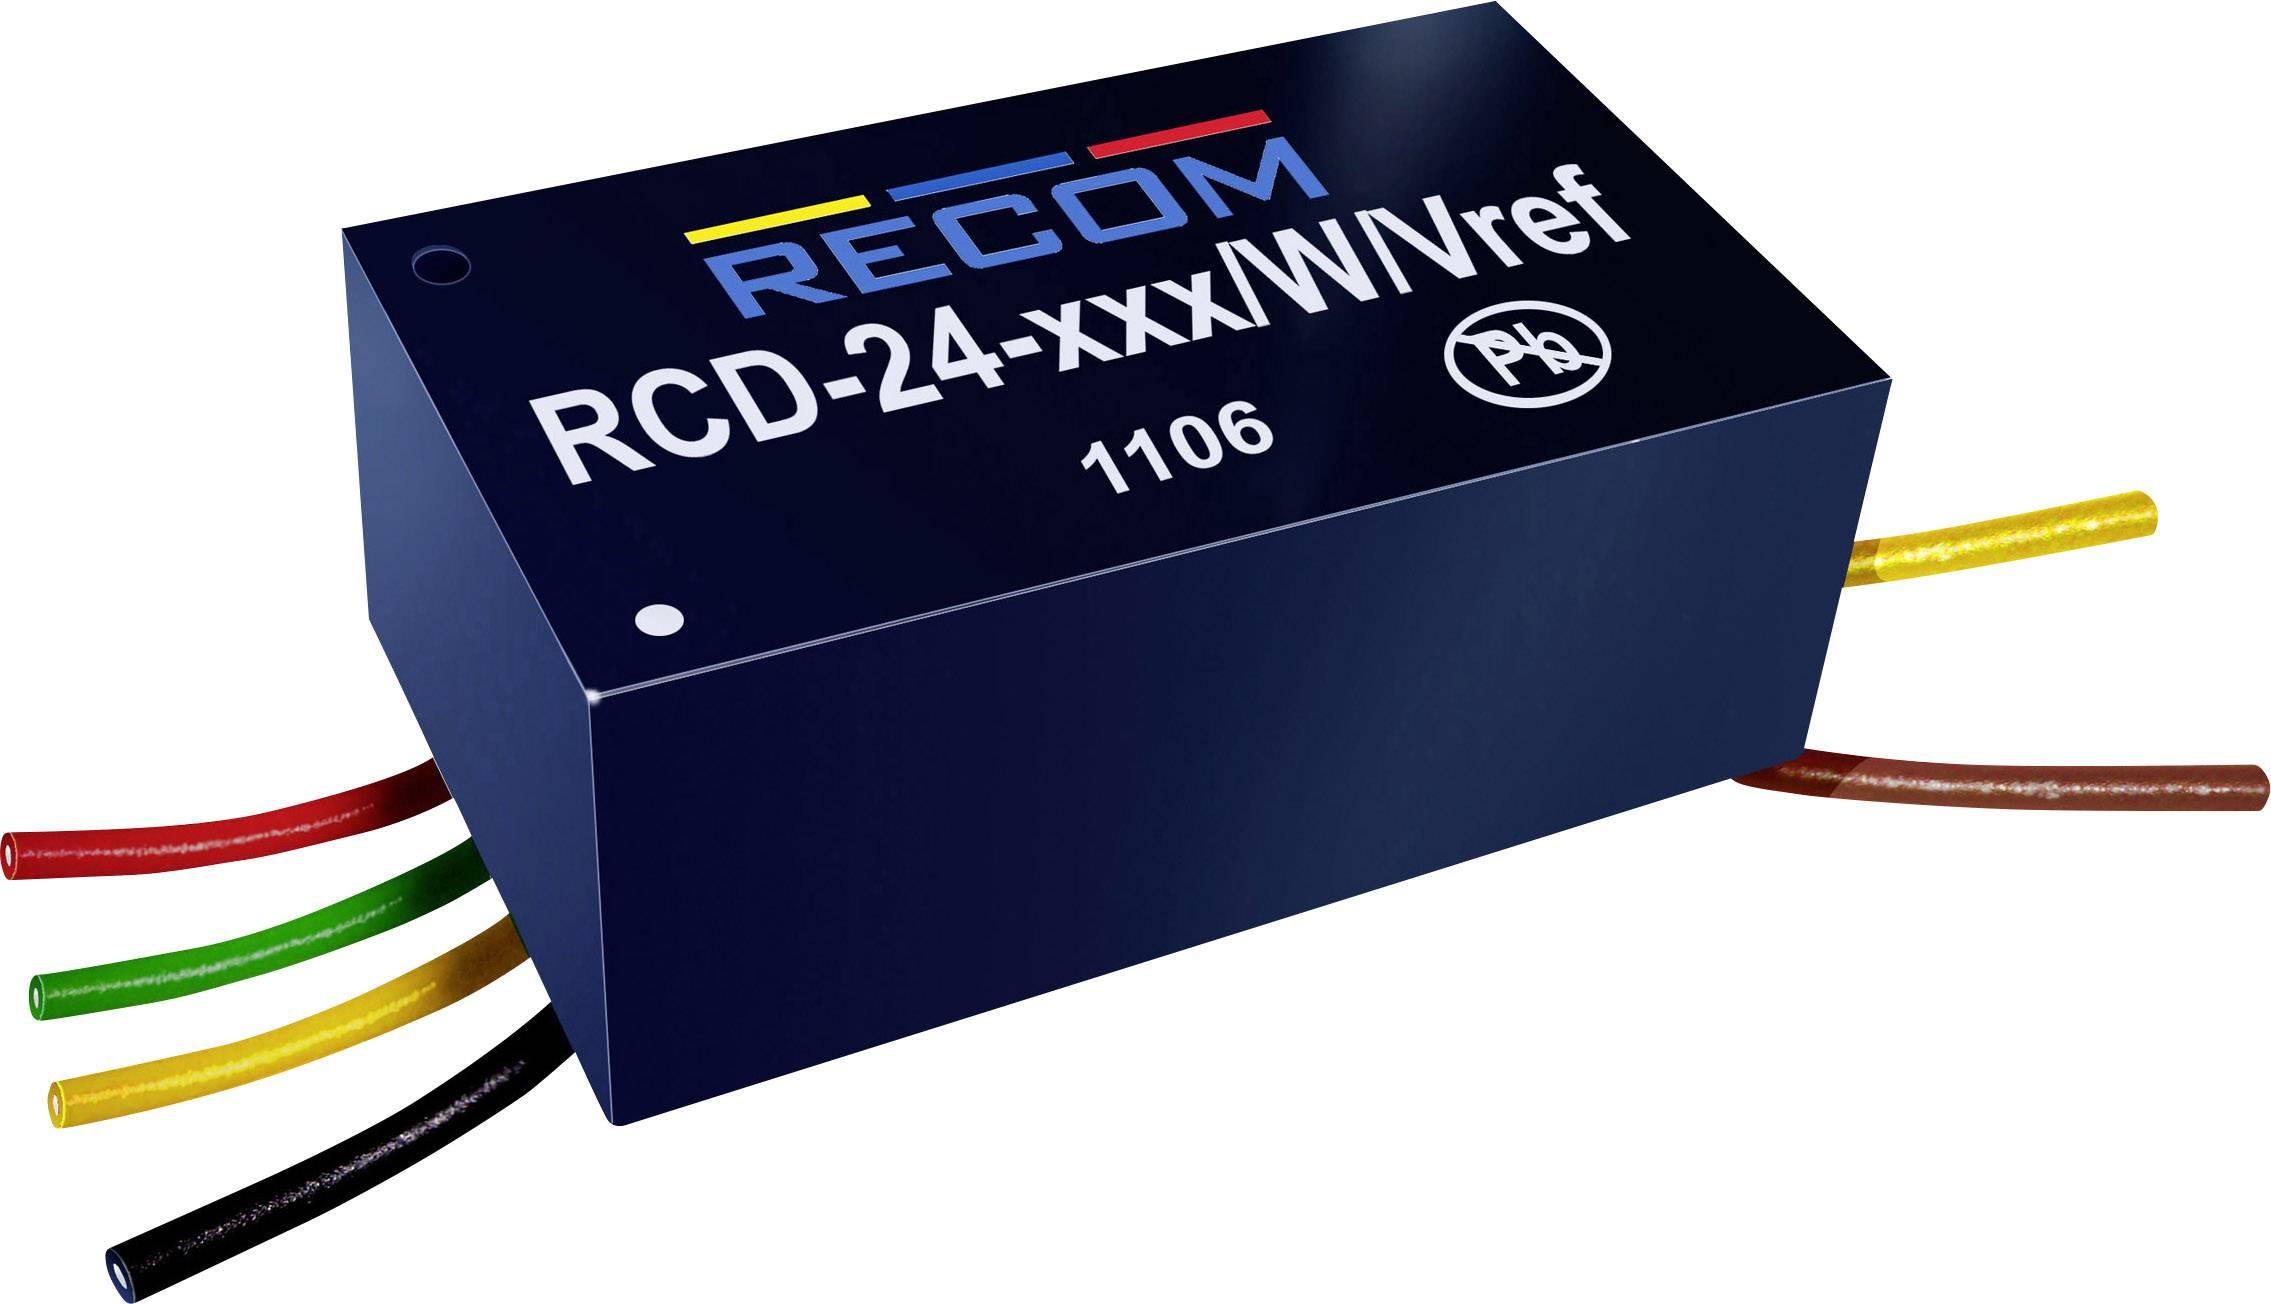 LED driver Recom Lighting RCD-24-1.20/W, kabel bez konektorů